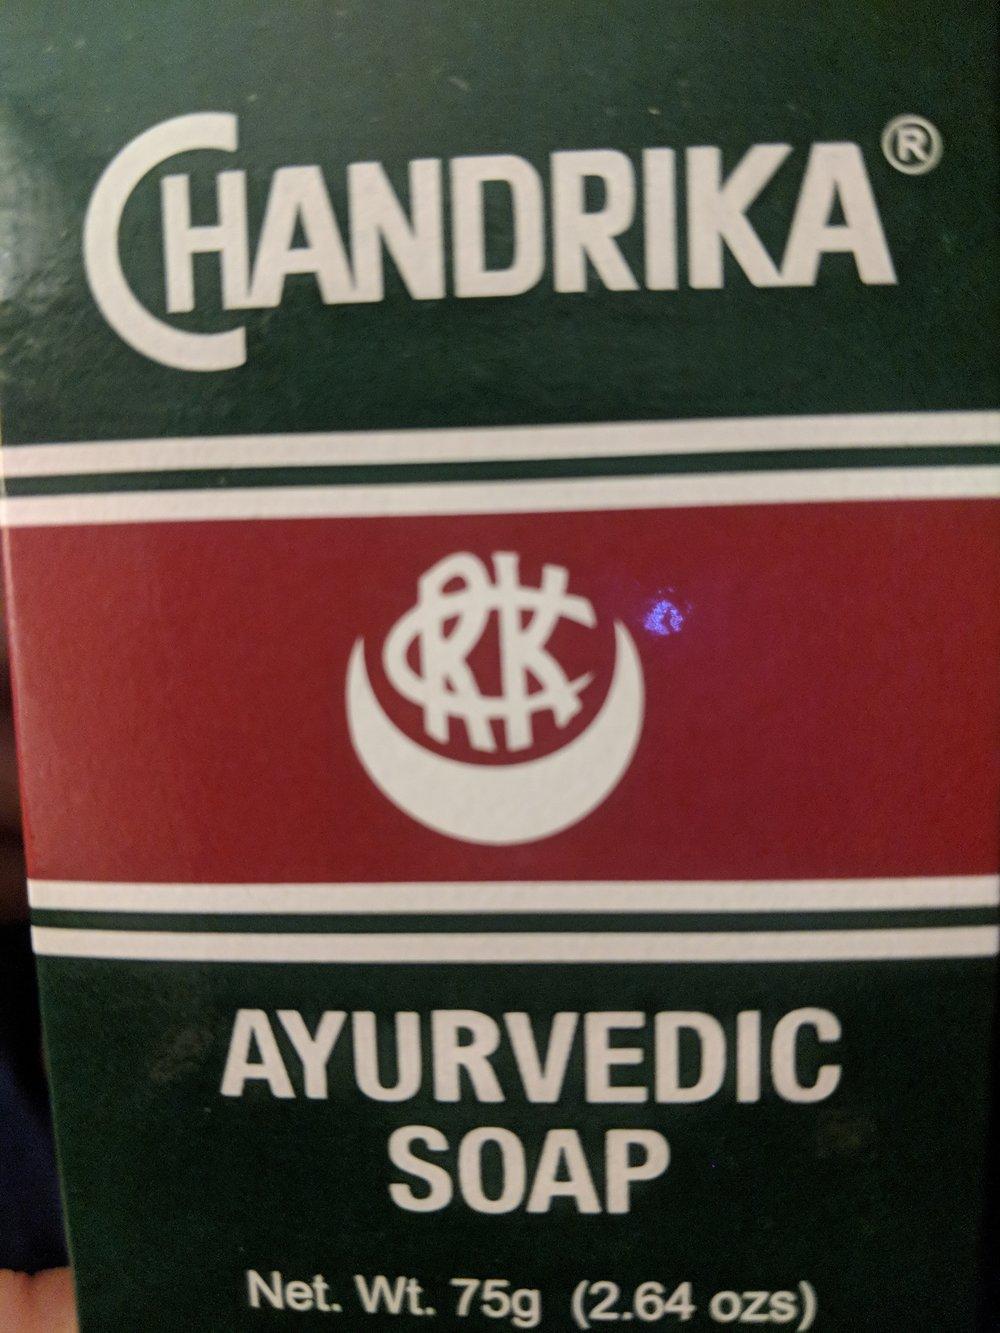 I love Chandrika!